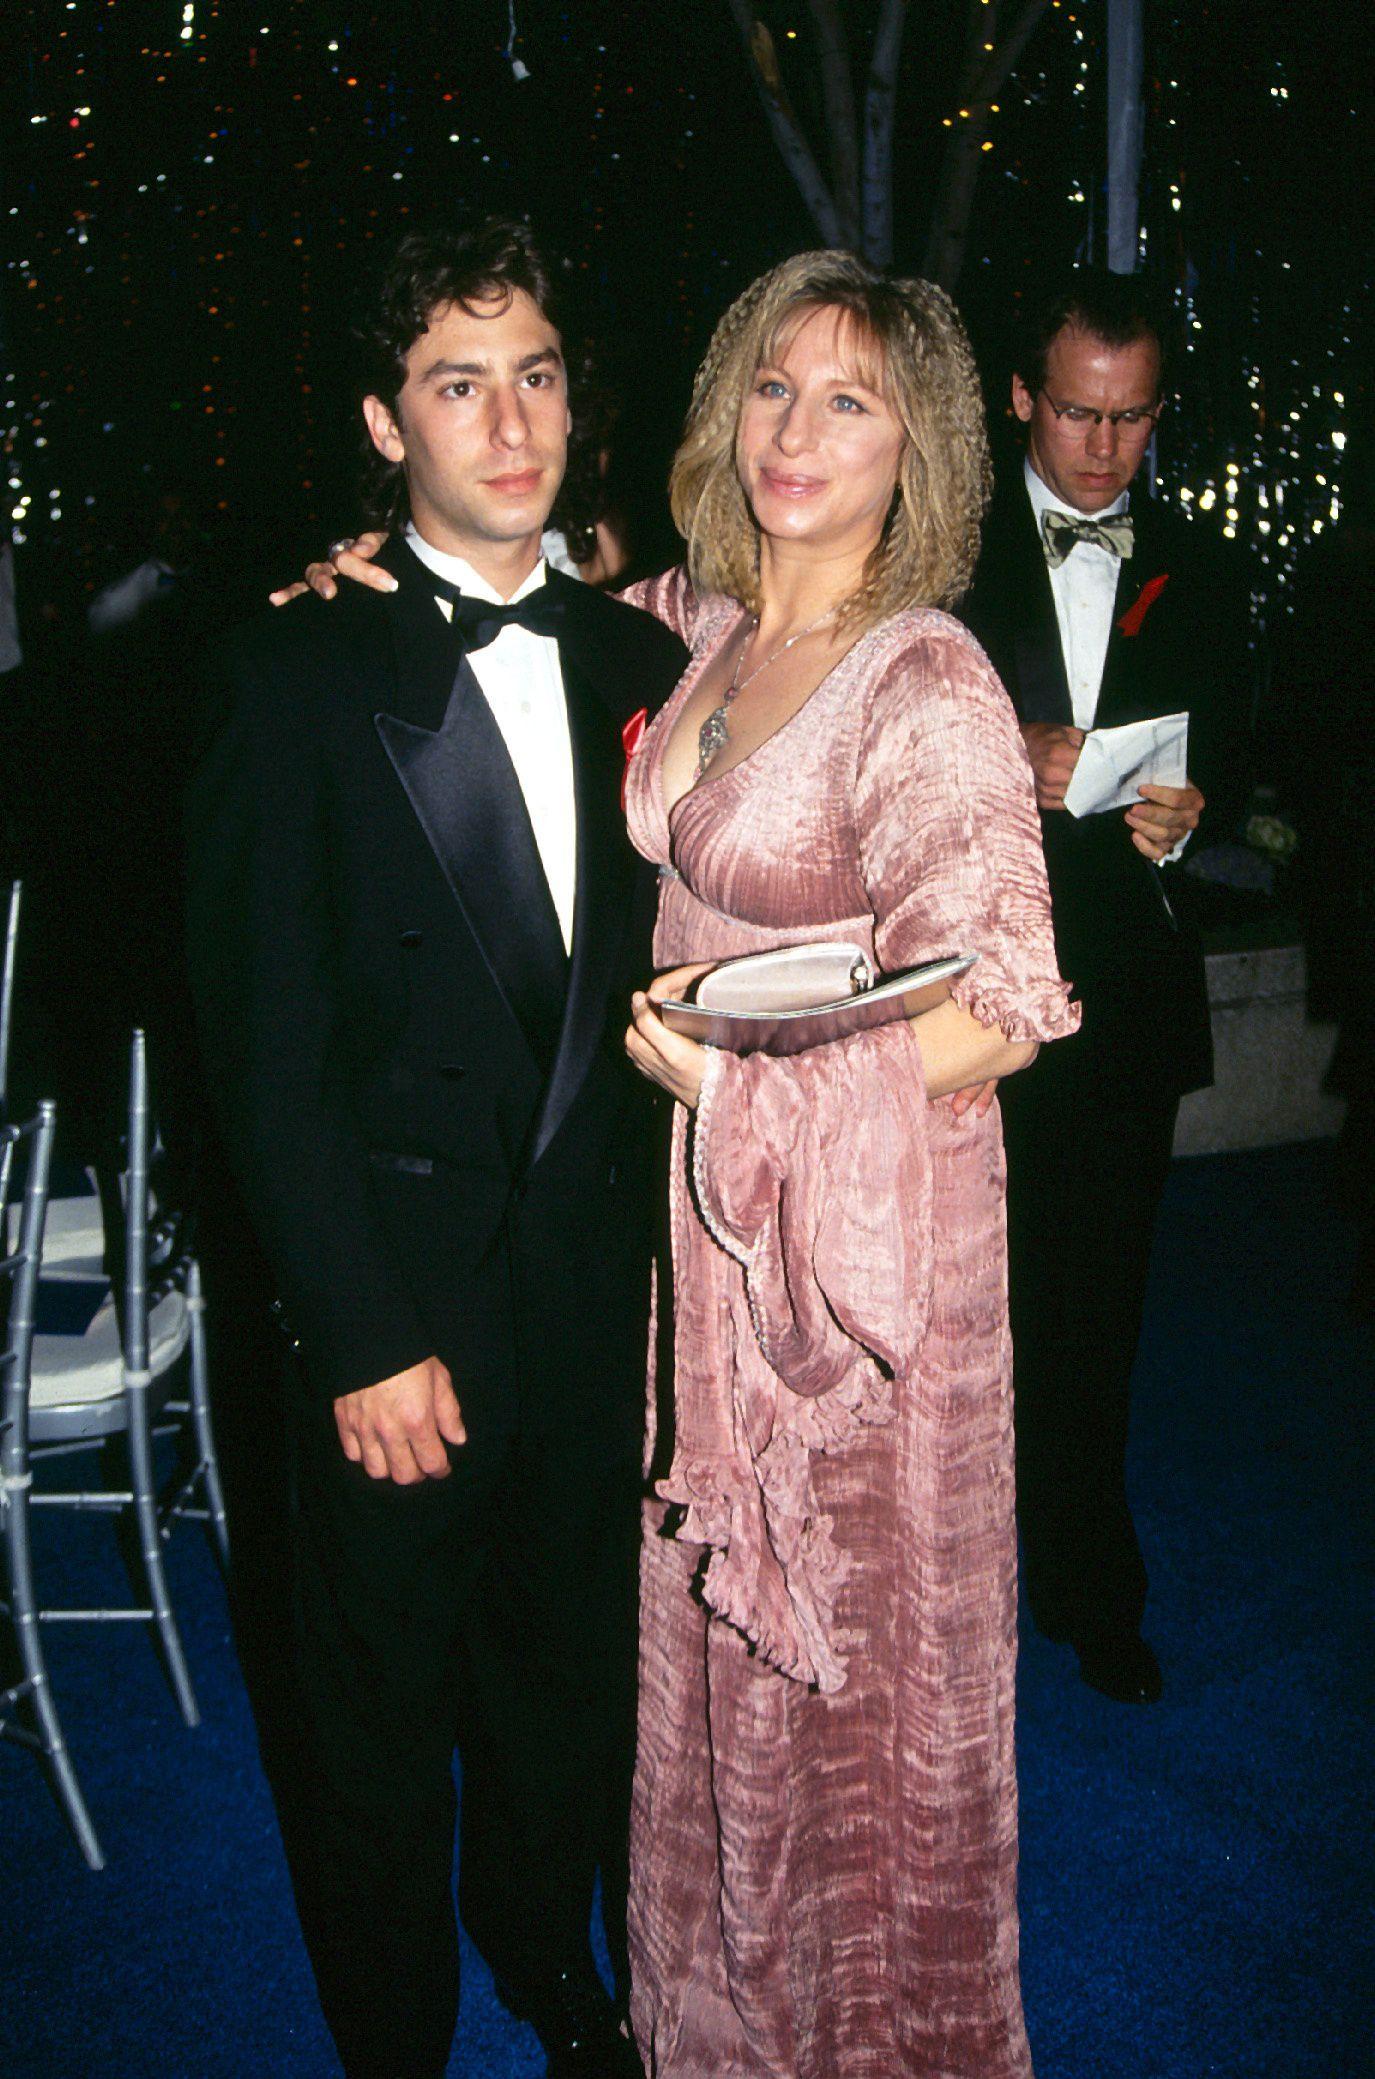 Barbra Streisand's Life In Pictures